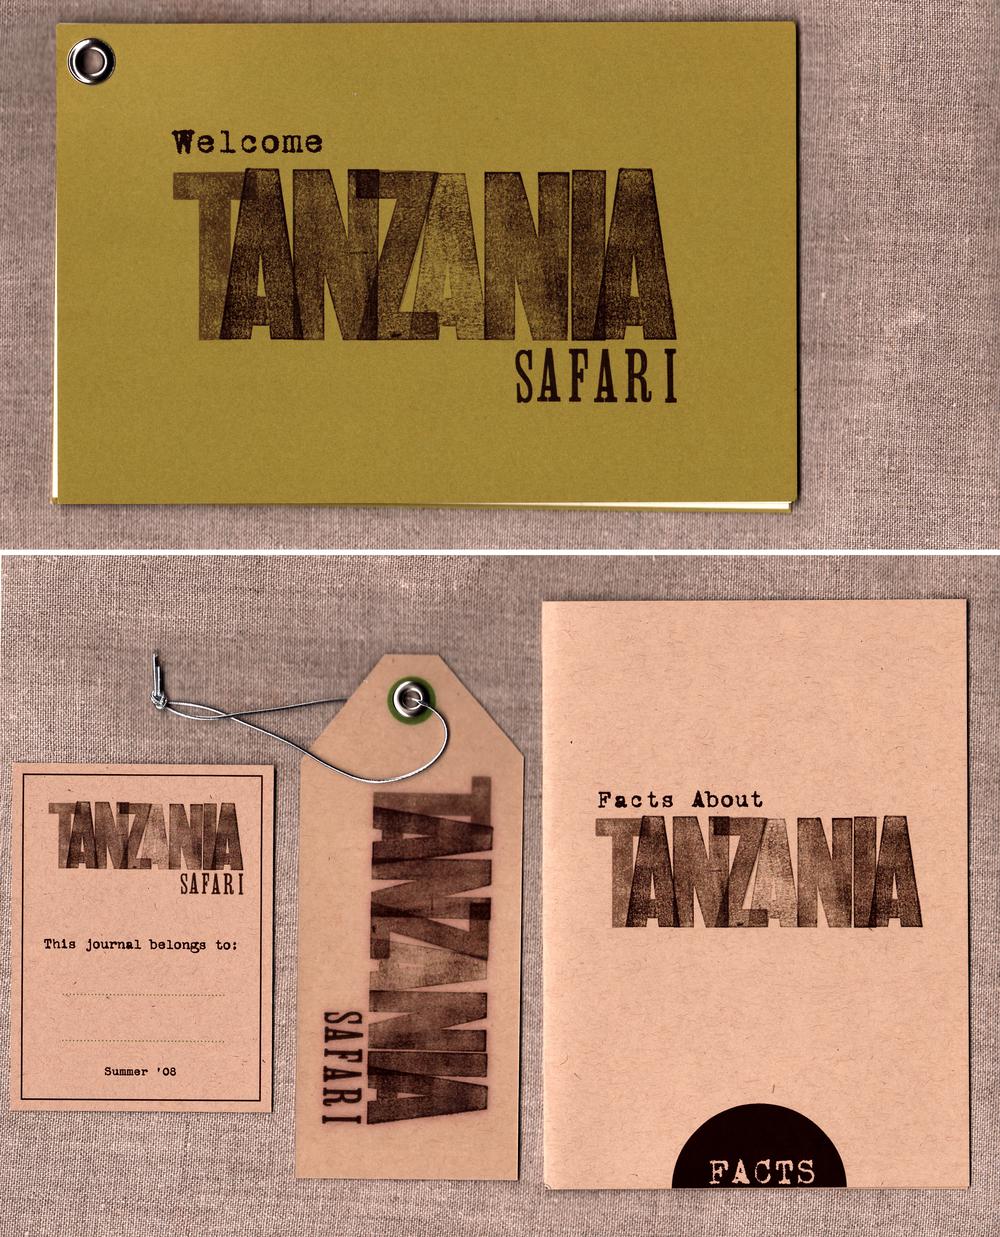 Travel_Tanzania.jpg